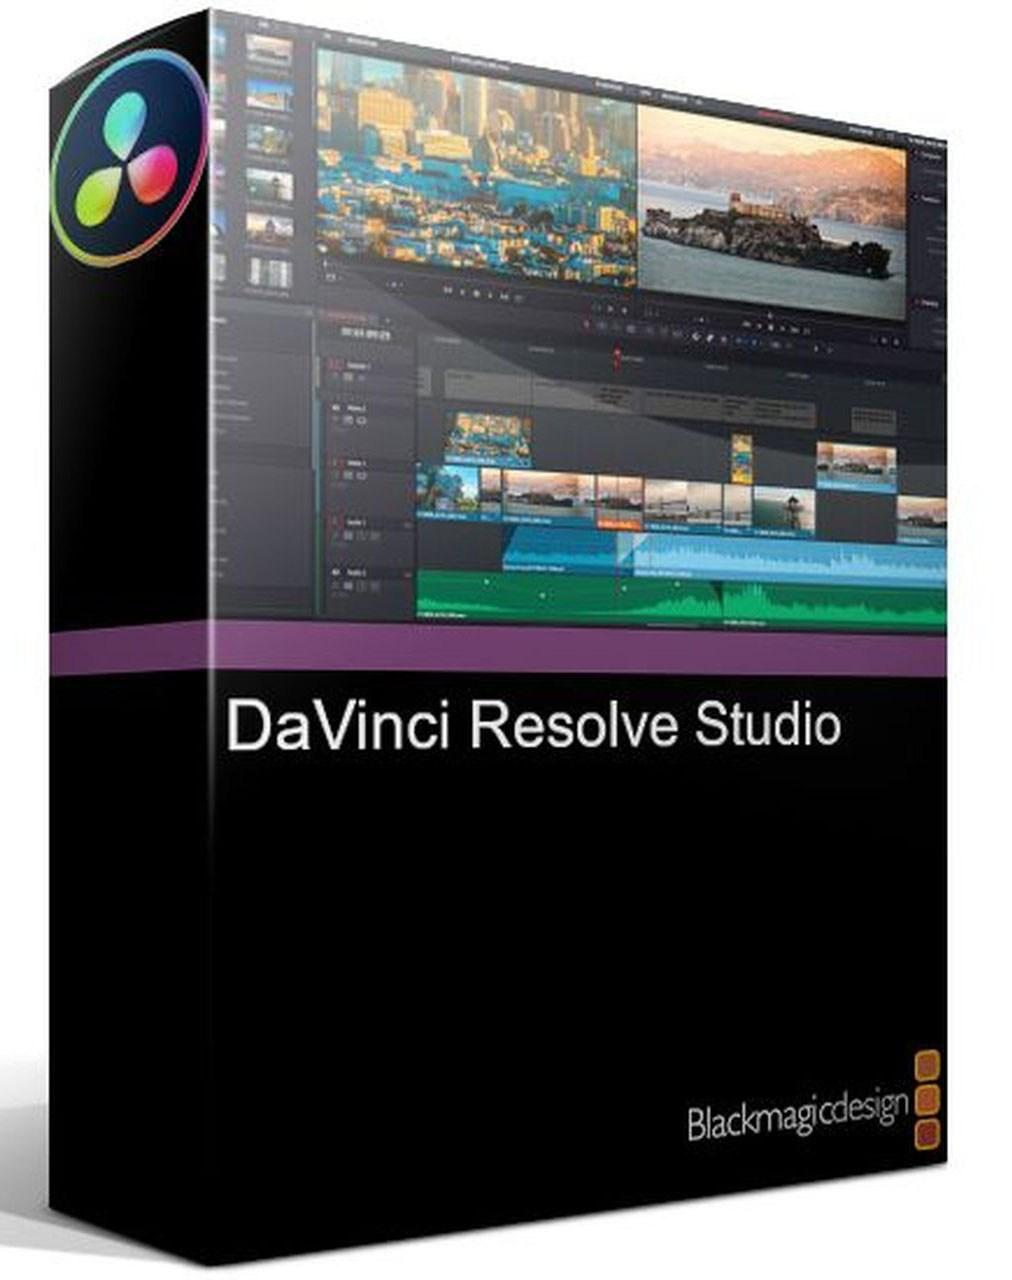 DaVinci Resolve Studio 17.2.0.0011 Crack + Activation Key Latest